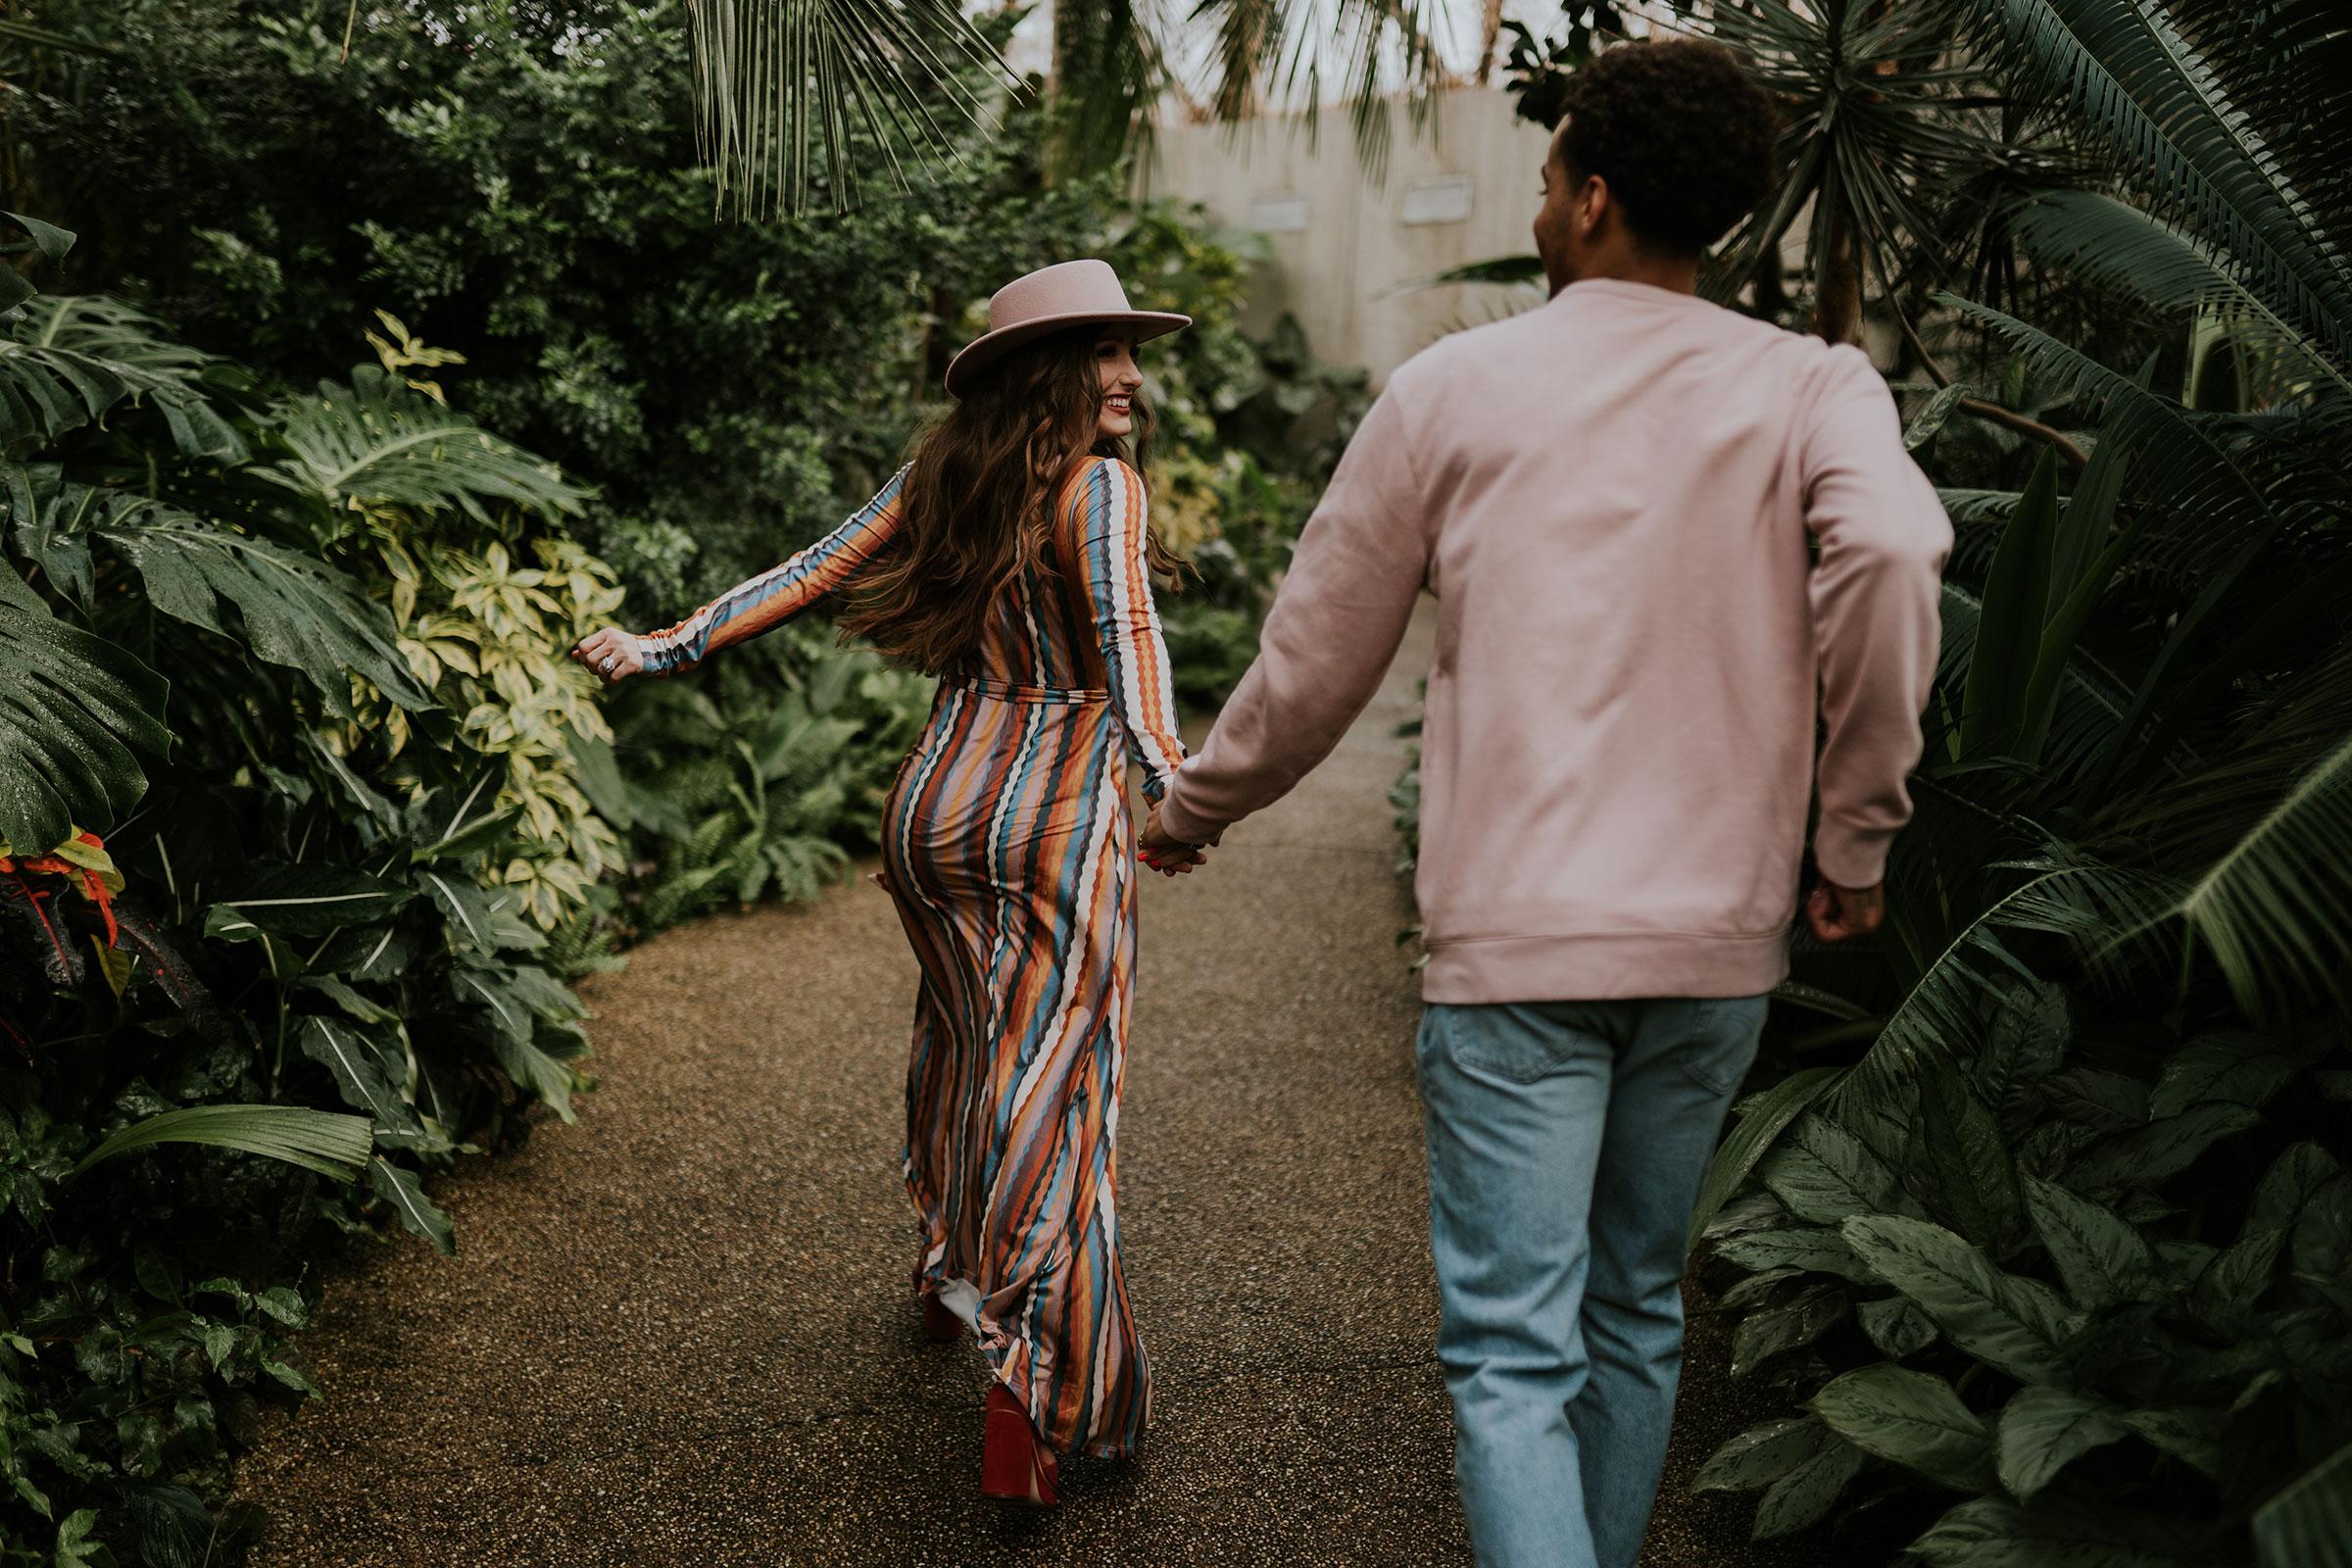 woman-and-man-running-through-botanical-gardens-engagement-desmoines-iowa-raelyn-ramey-photography.jpg